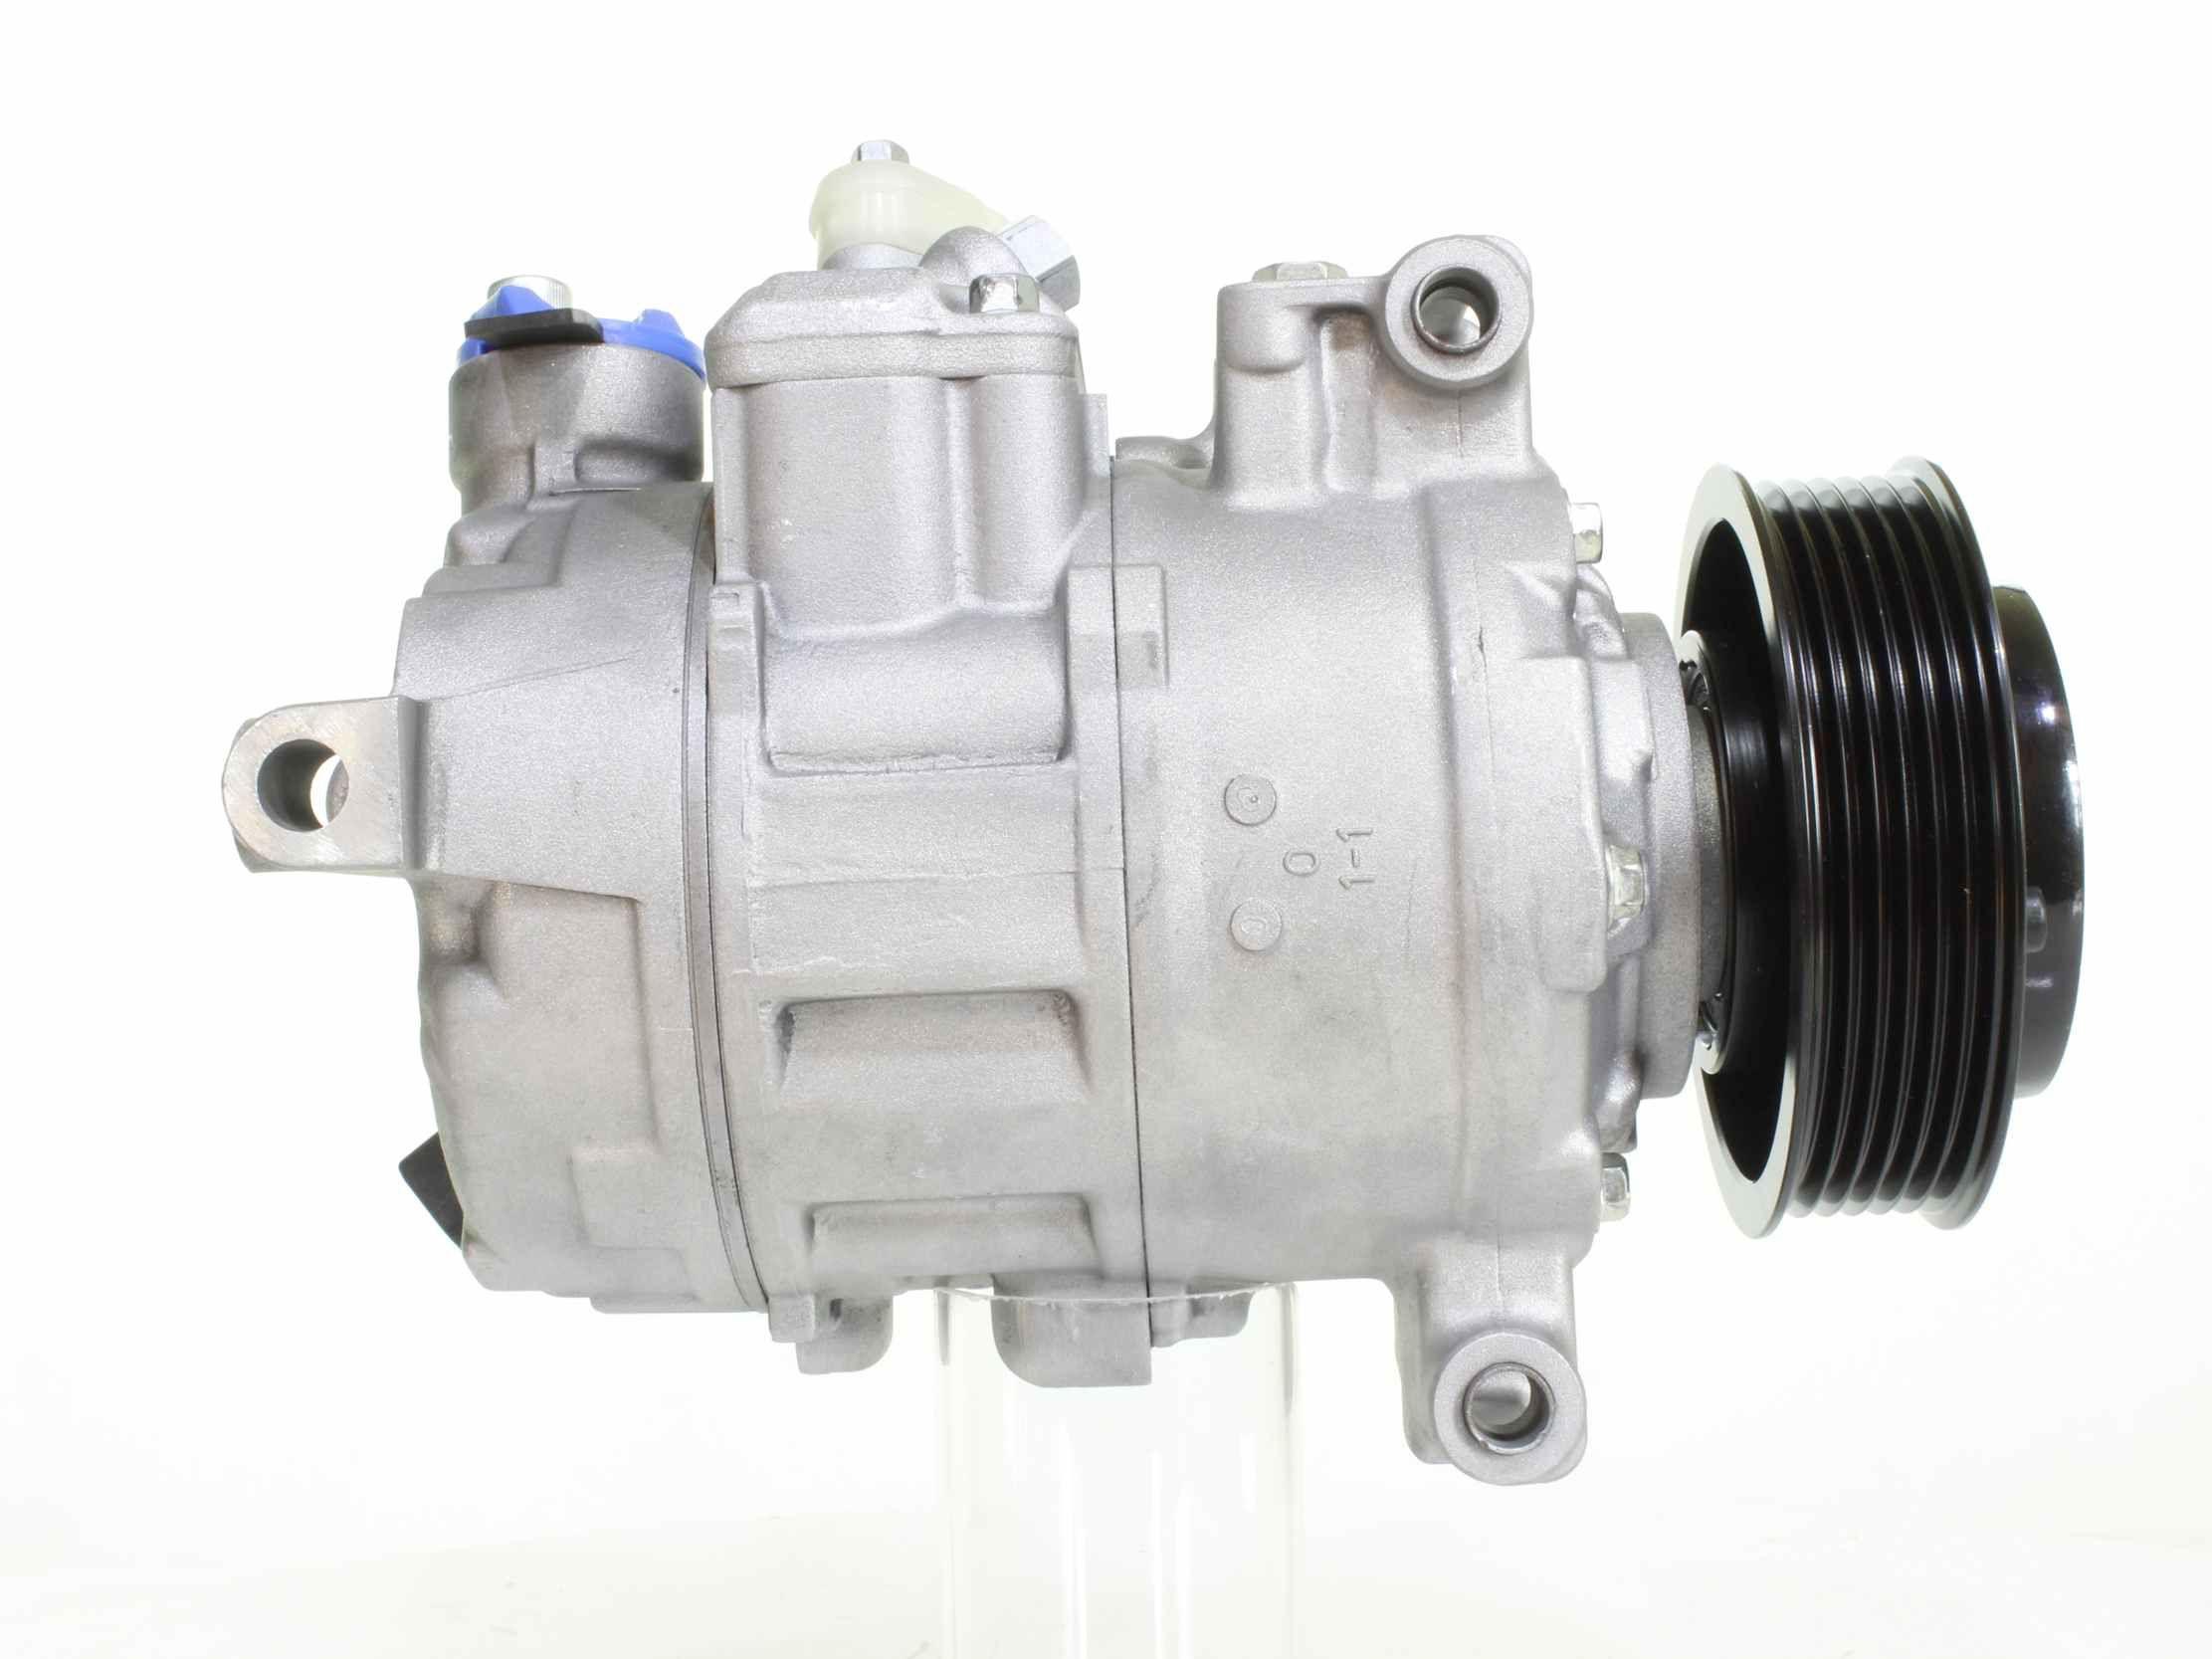 10550608 Kompressor, Klimaanlage ALANKO 550608 - Große Auswahl - stark reduziert